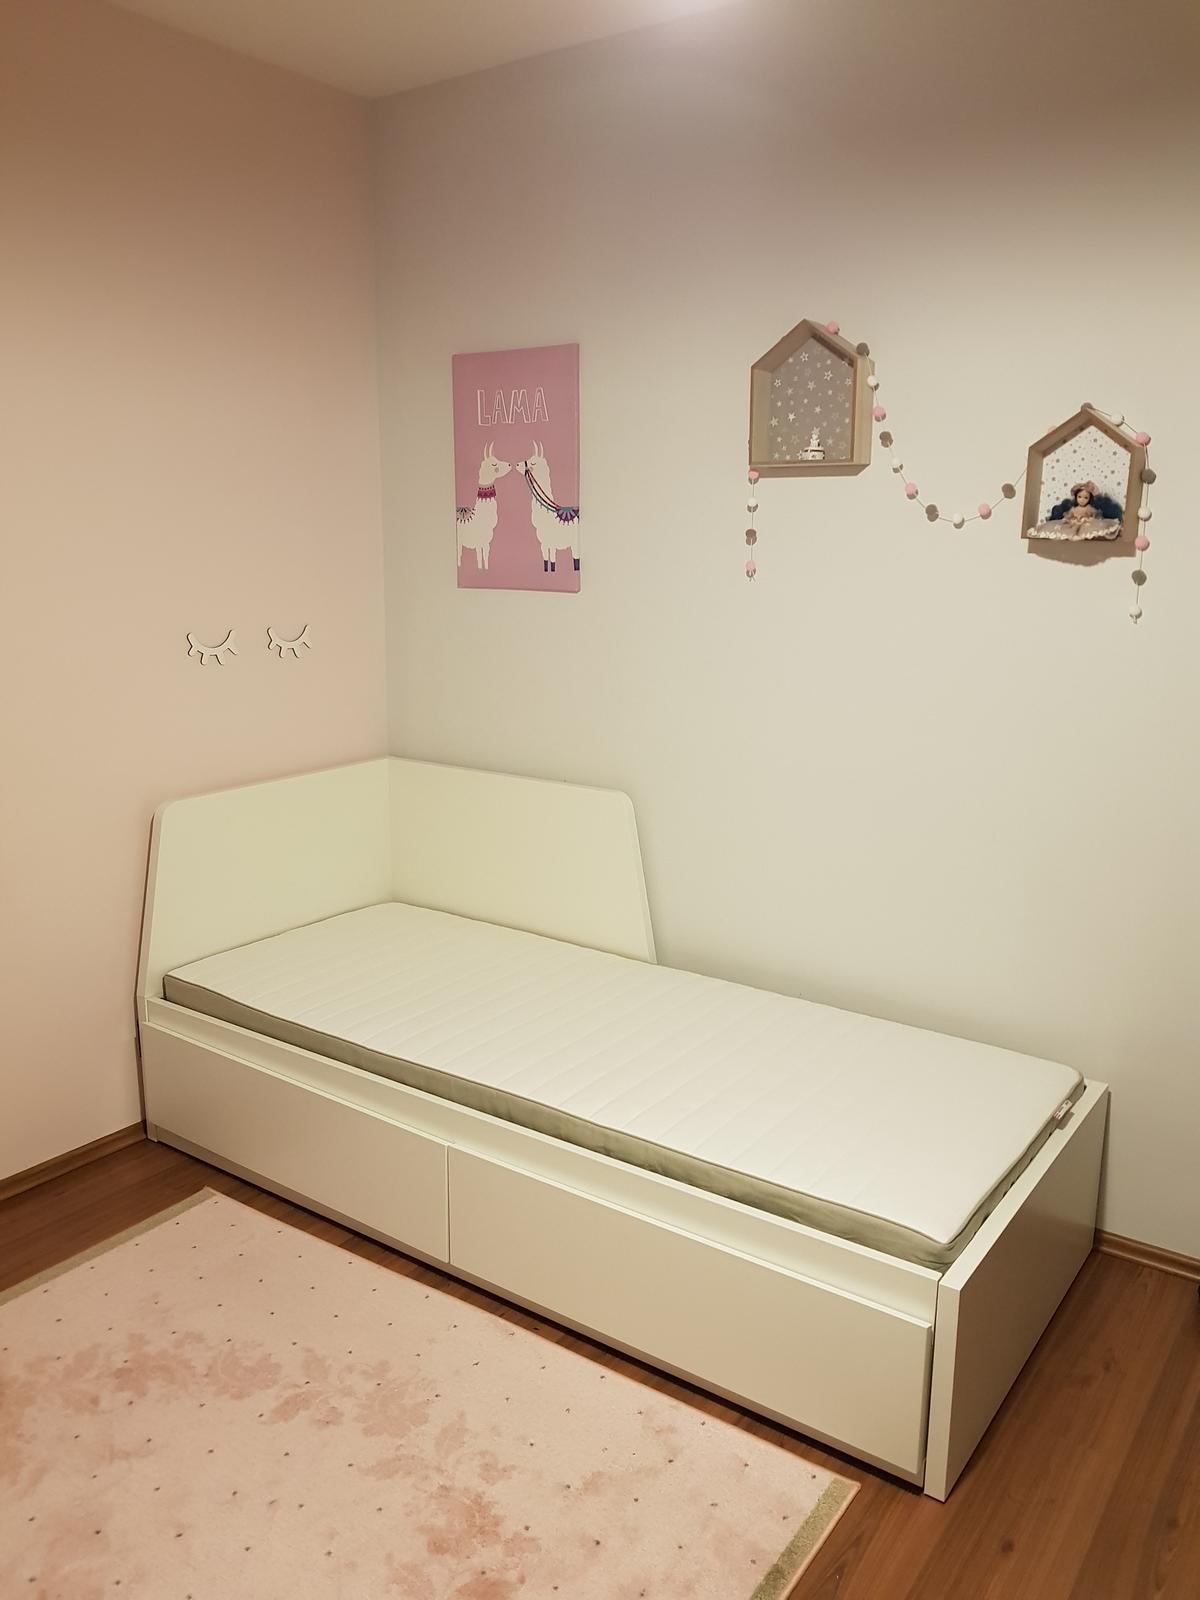 Projekt hostovska  nakoniec detska :-D - Nova postel..konecne...